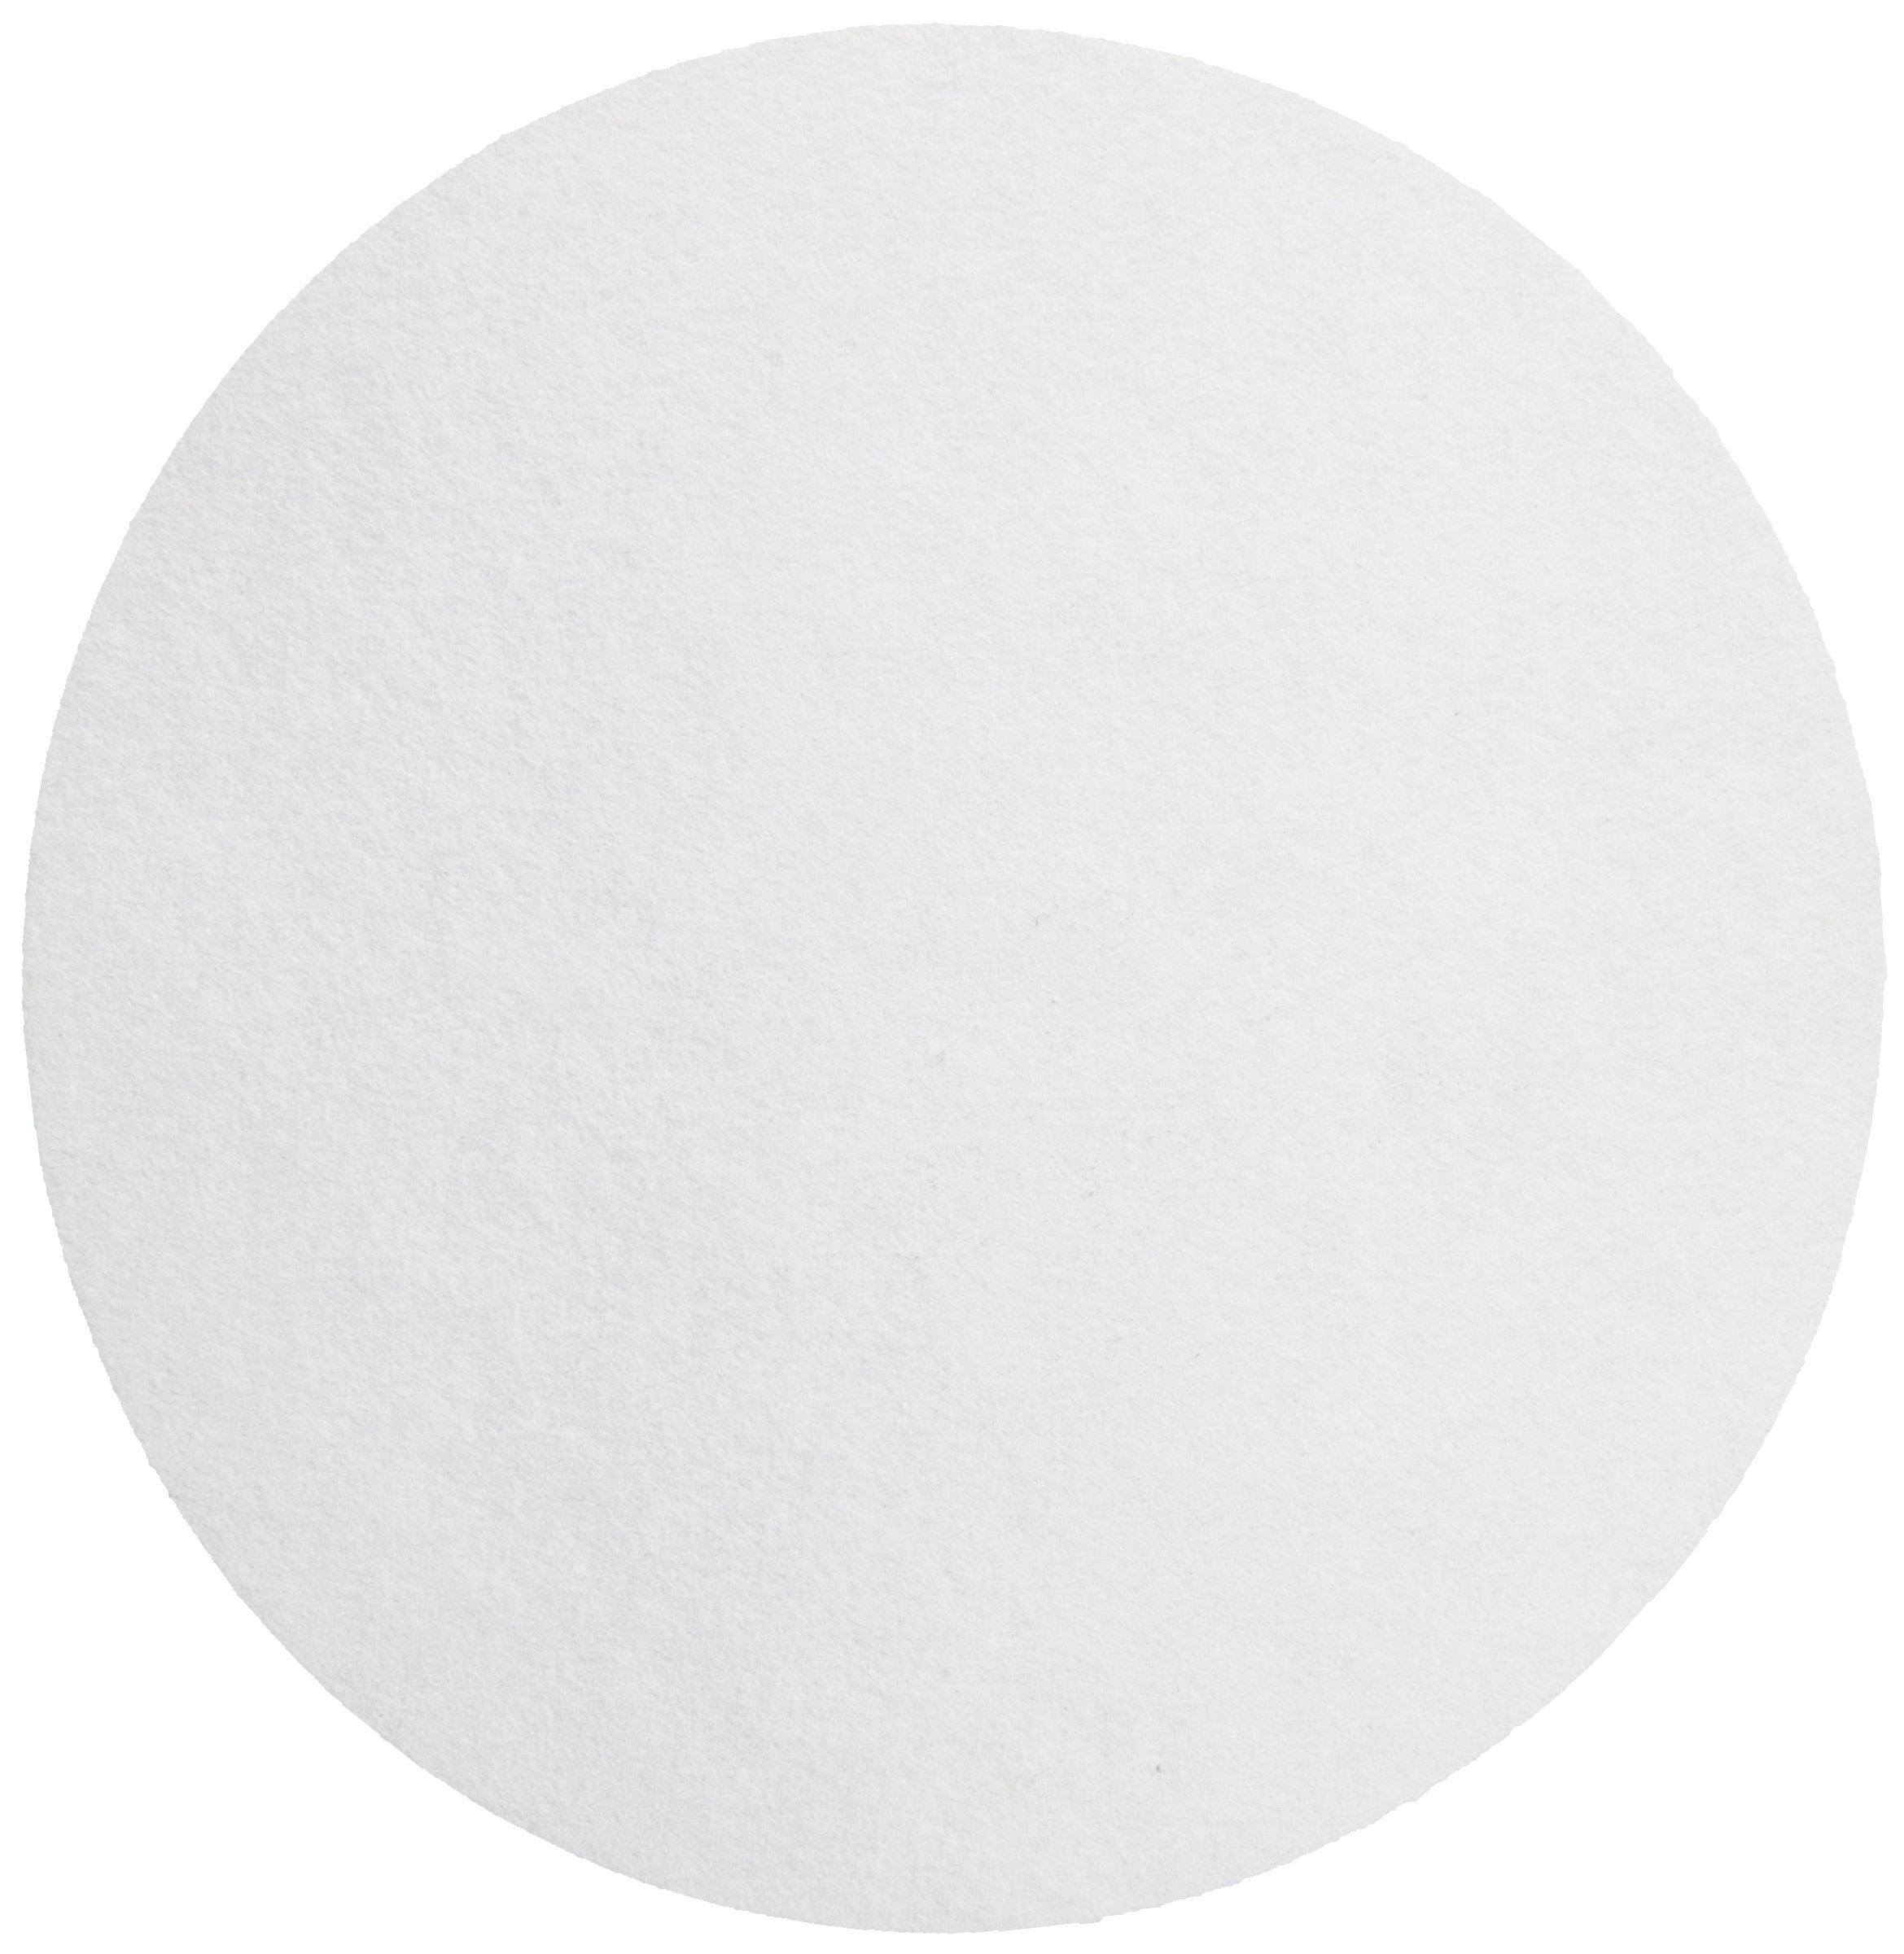 Whatman 1444-150 Ashless Quantitative Filter Paper, 15.0cm Diameter, 3 Micron, Grade 44 (Pack of 100) by Whatman